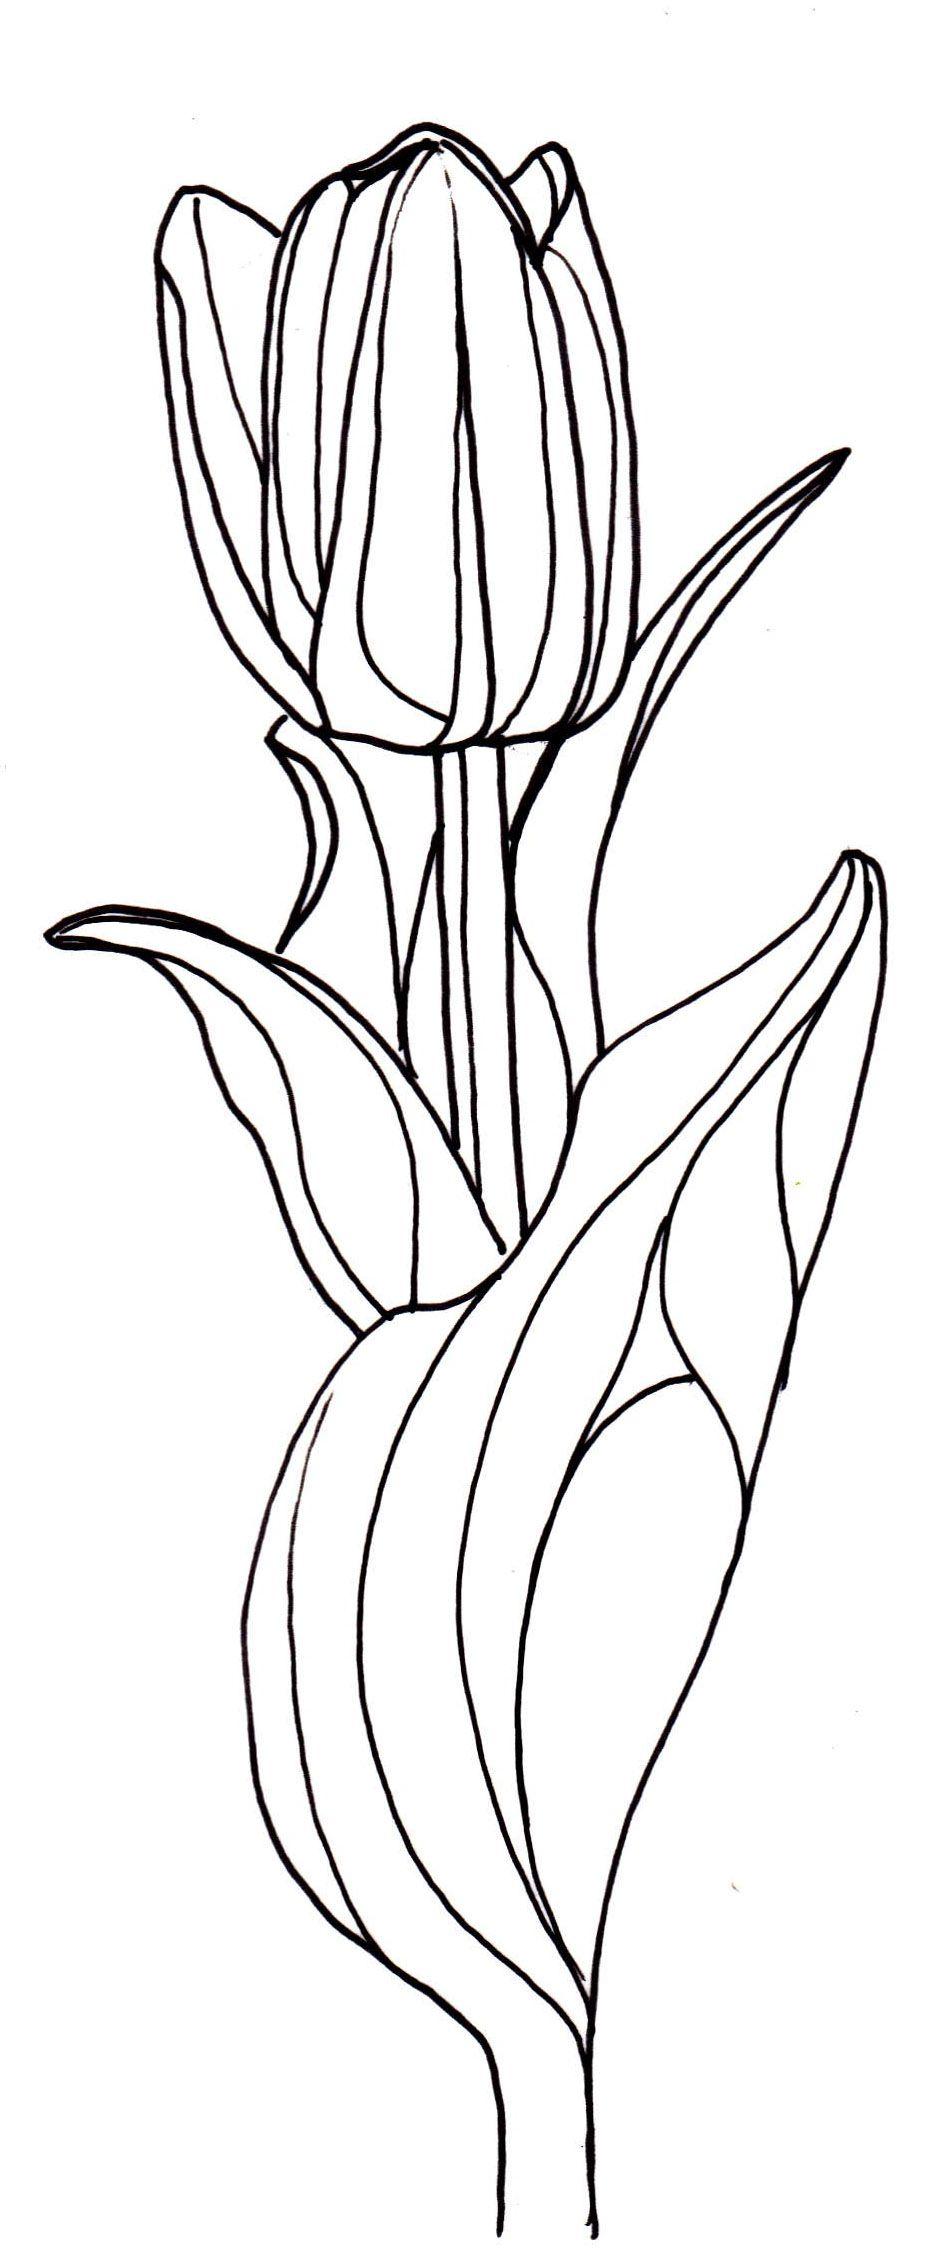 Line Drawing Of Tulip Flower : Line drawing flowers tulip drawings pinterest